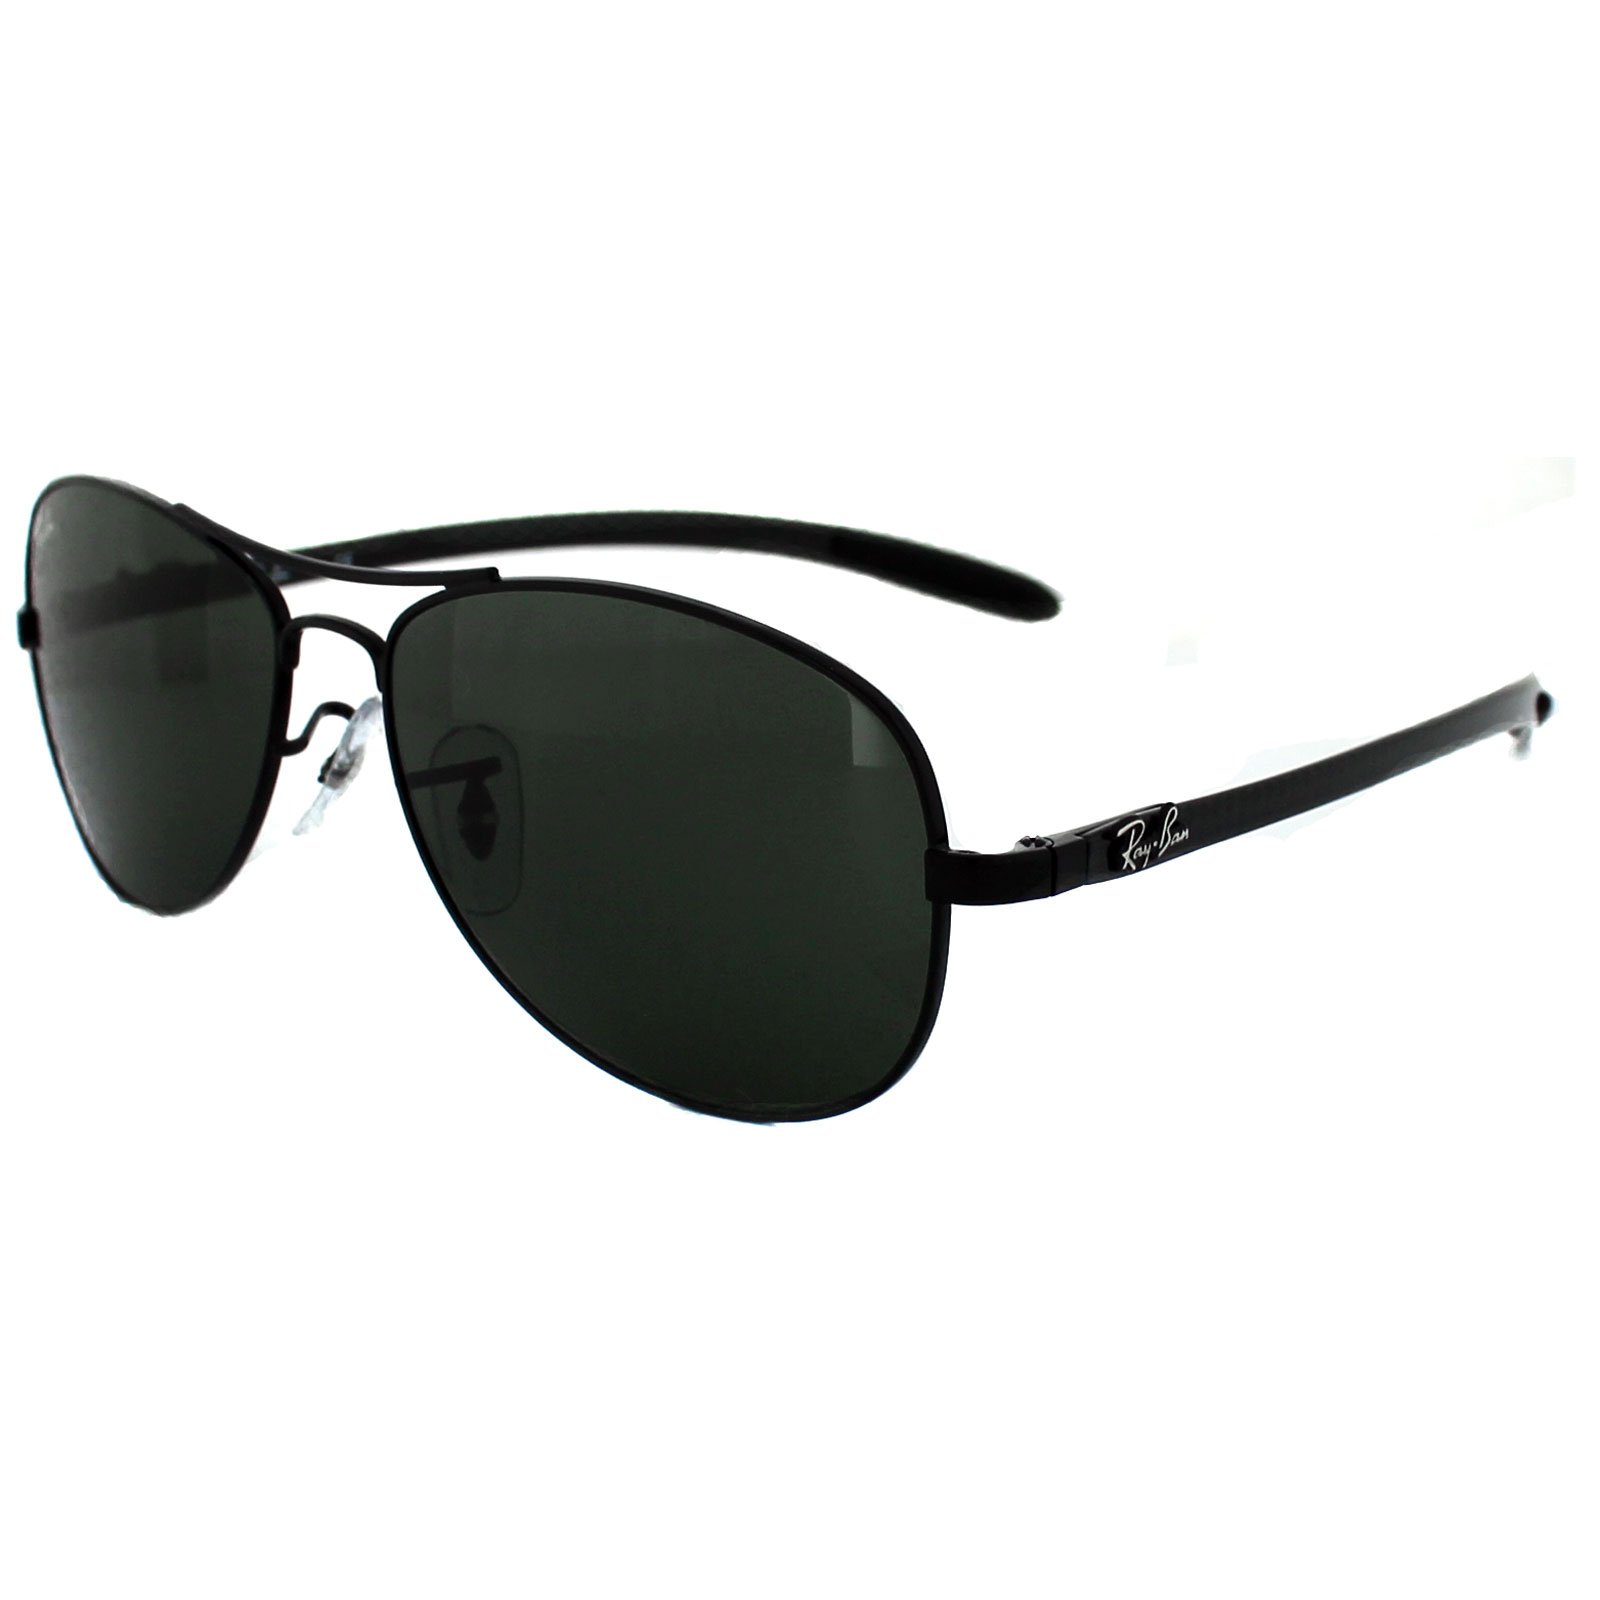 757cd6e8a1 Ban Sunglasses Heritage Uk Ebay Malta « Ray qOxEOnPt. «